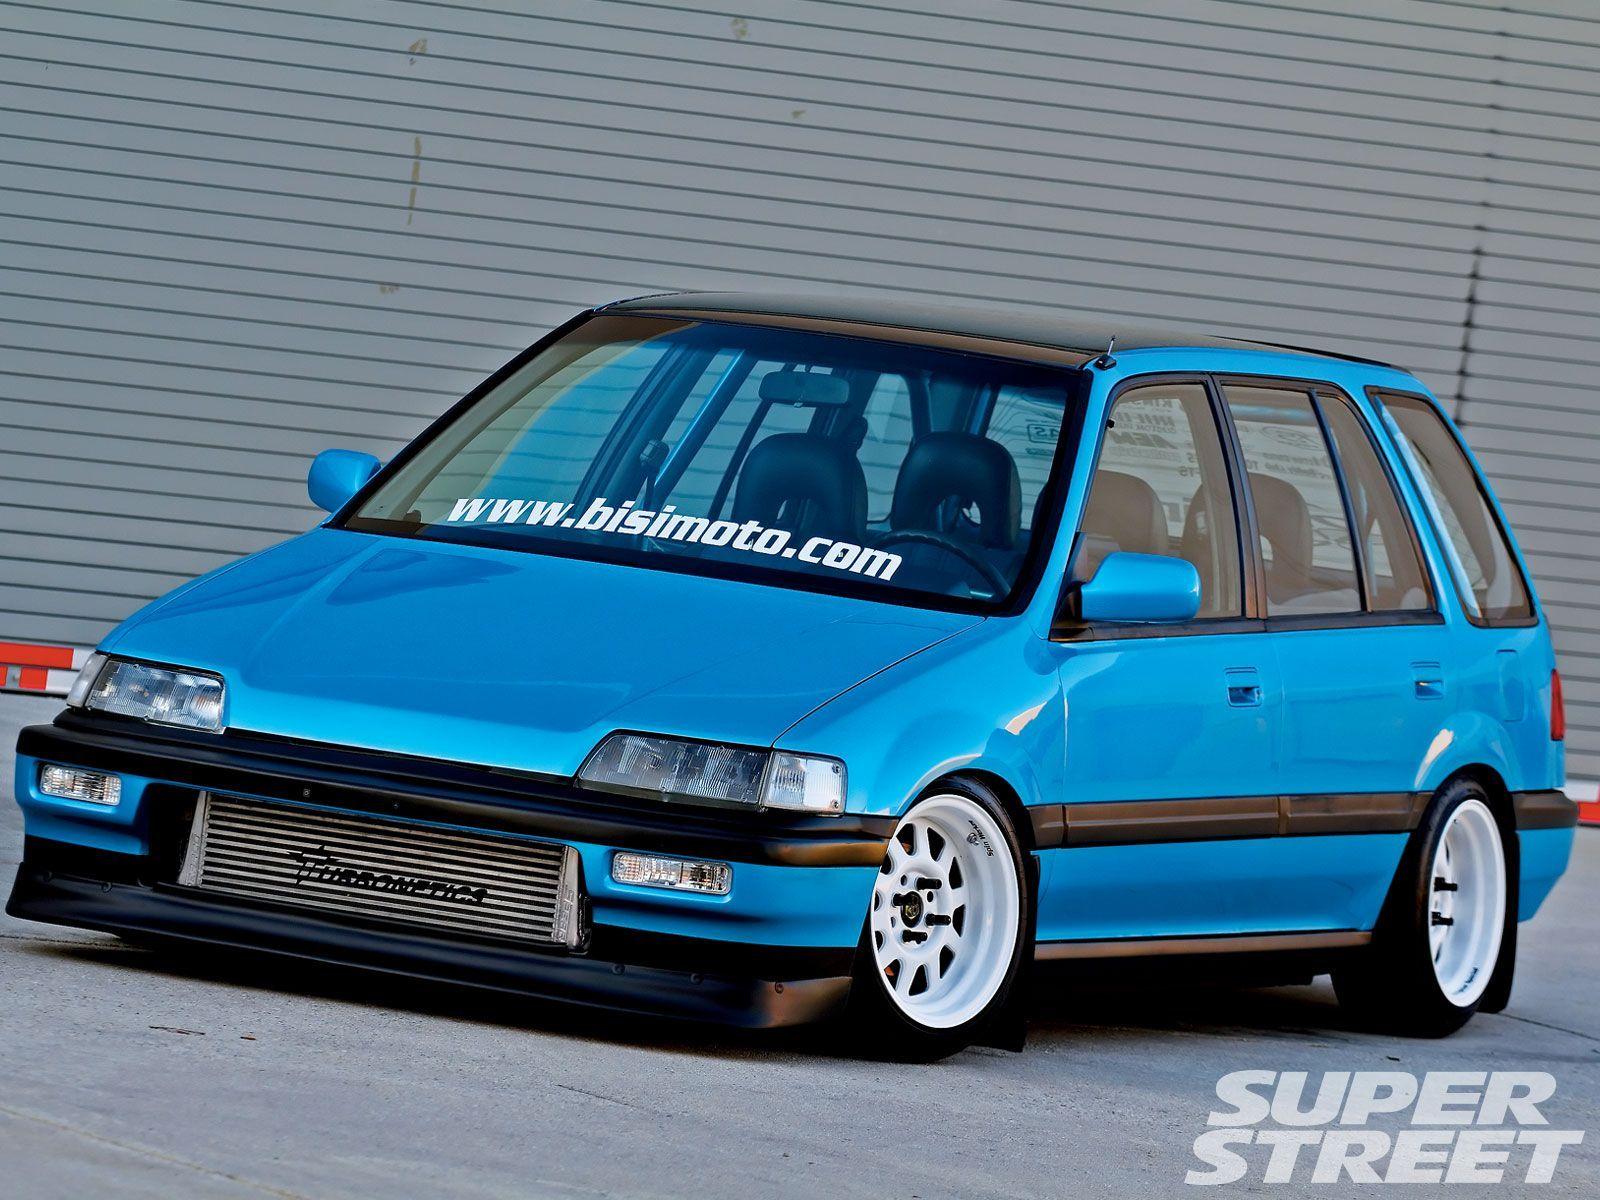 1988 Honda Civic Wagon - Vehicle Specifications | 1988 Honda Civic Wagon |  Honda 1988 honda civic wagon sale miami fl cargurus Save $4118 on a 1988  honda ...